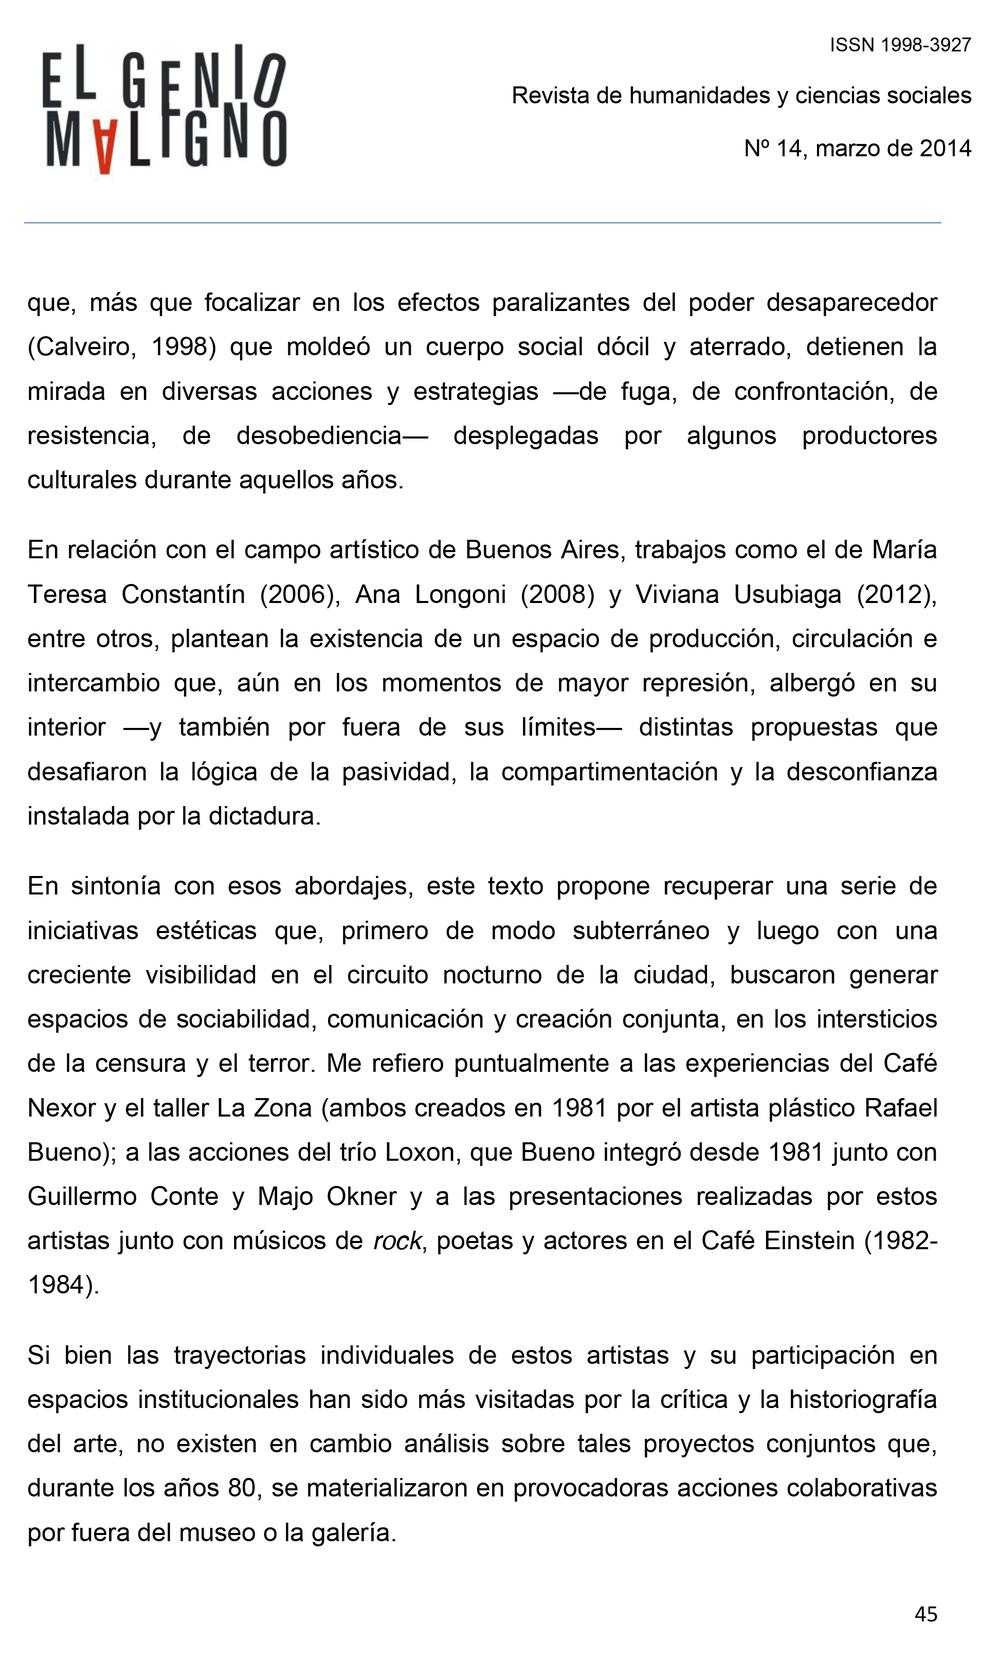 materia2_inhibición_lazonaloxoneinstein_dlucena-3.jpg